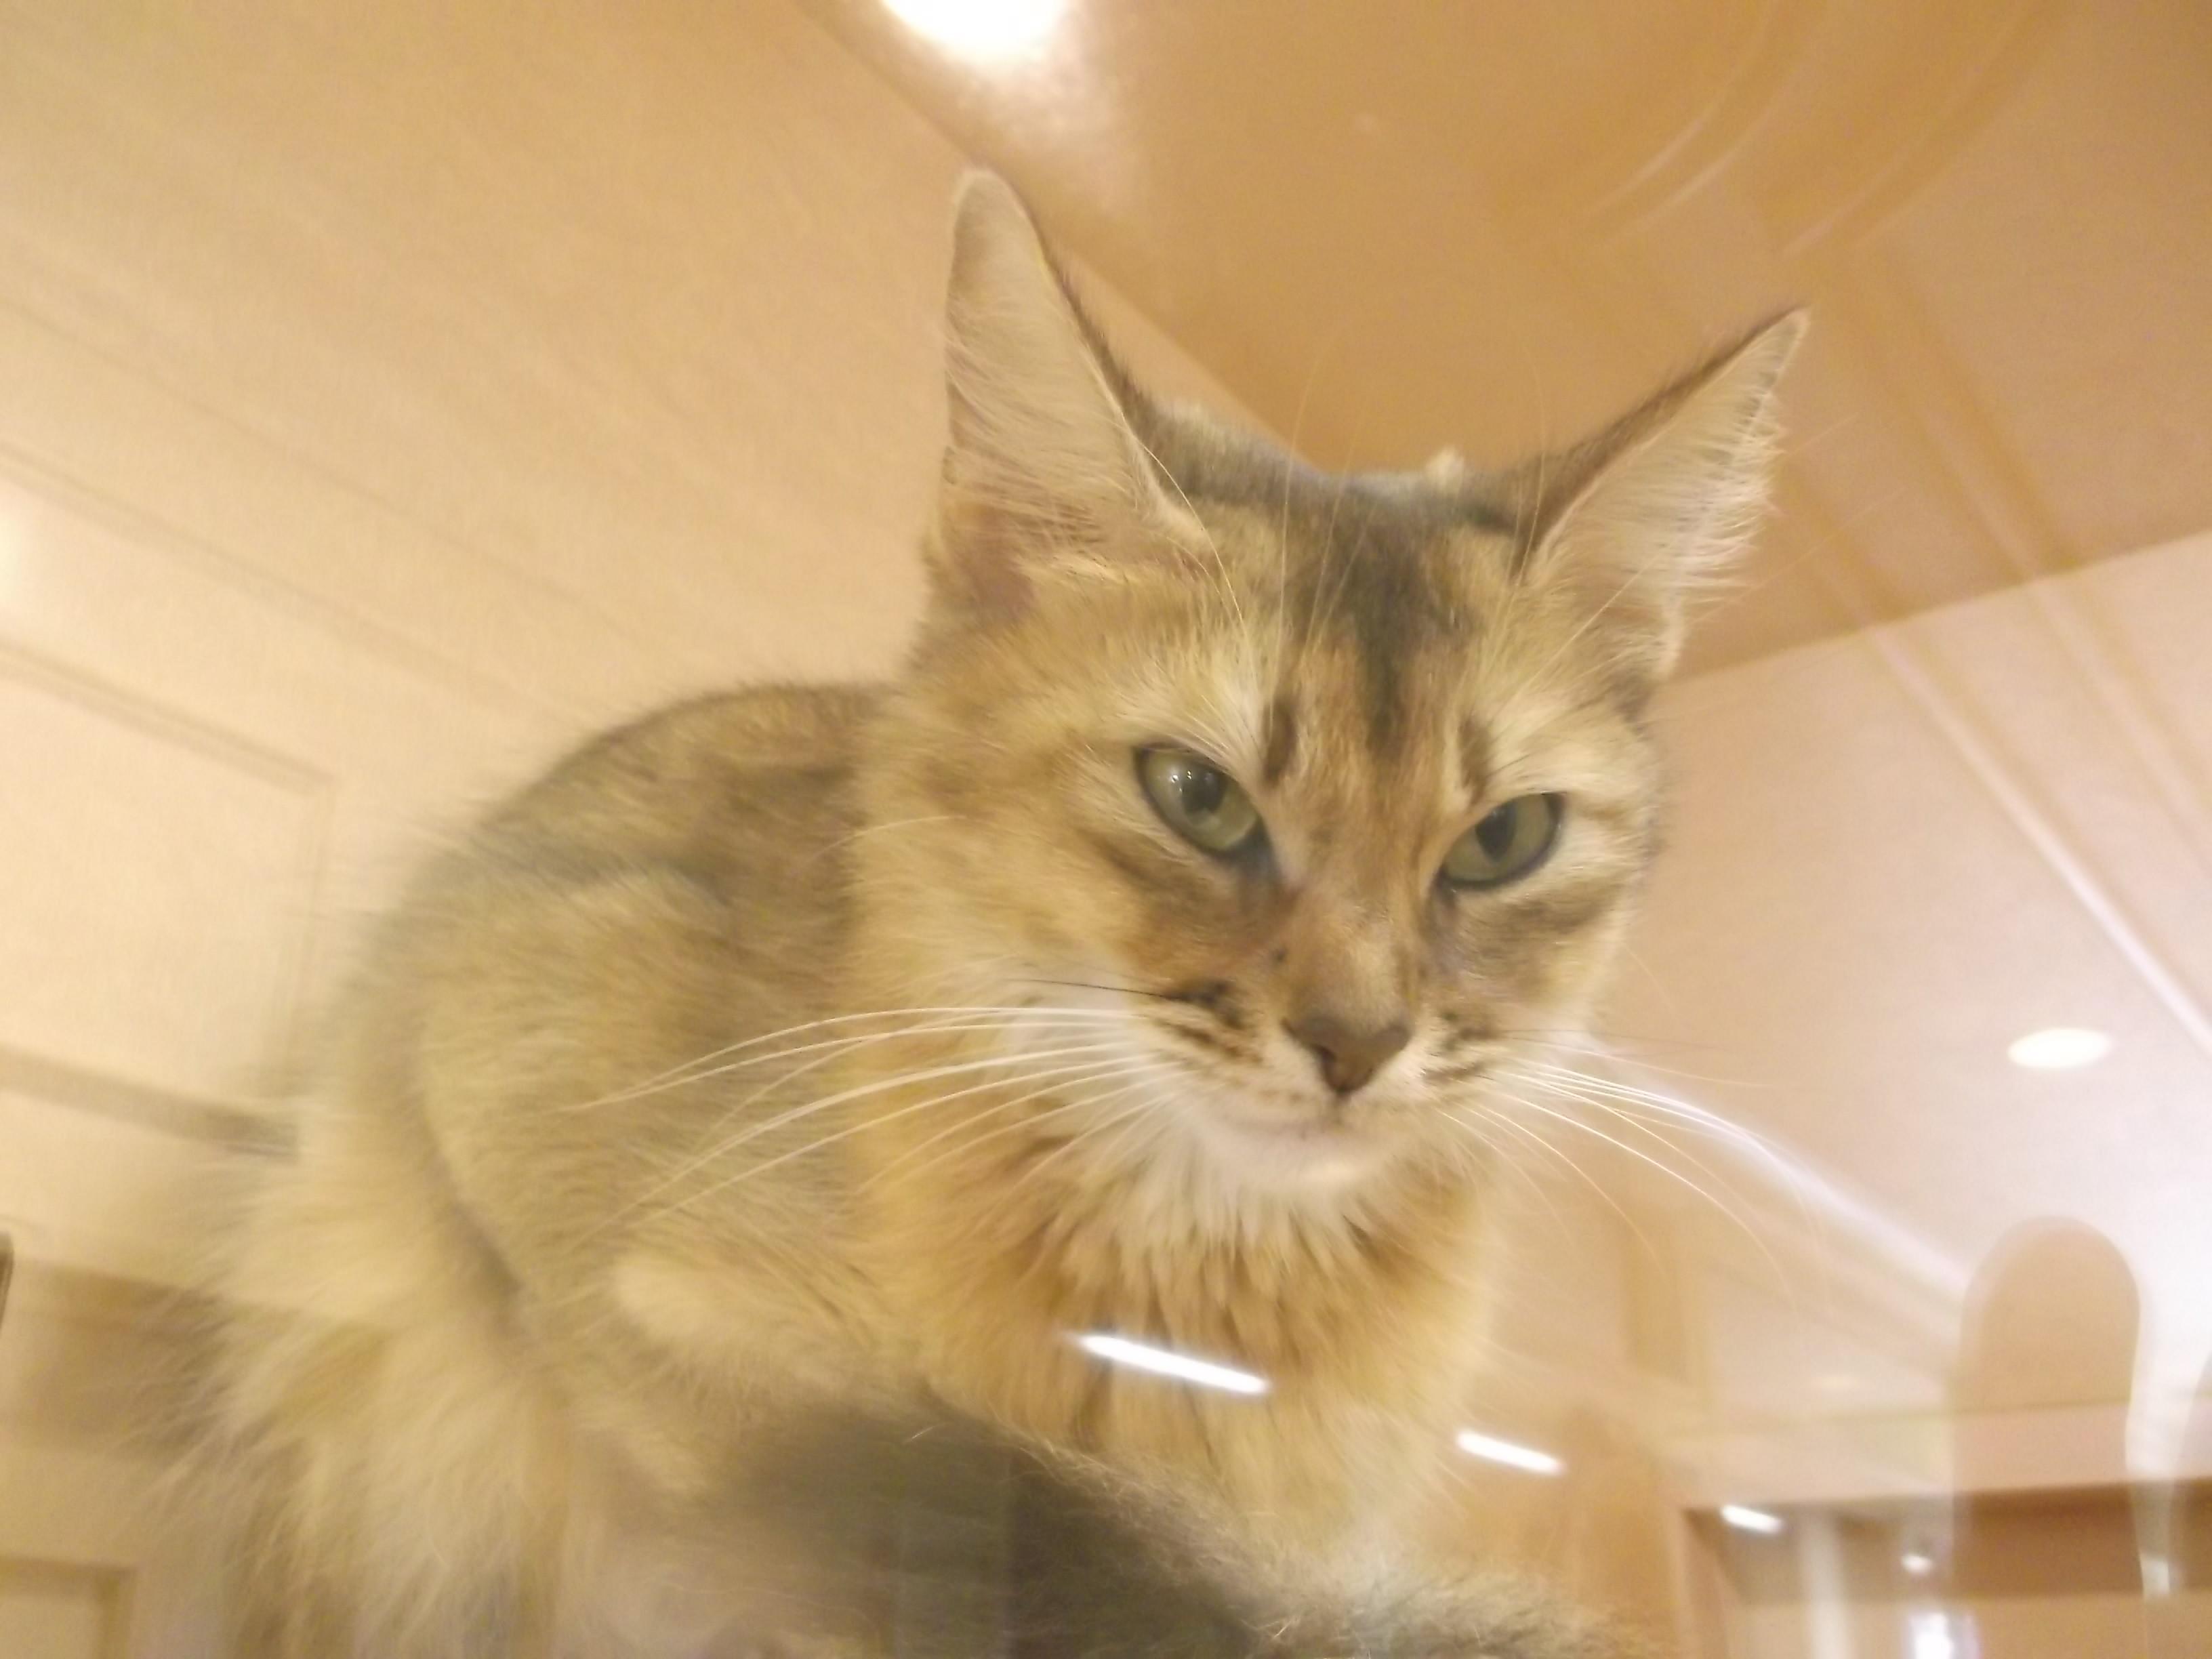 A・パーカー「バーディ」 : シェークスピアの猫